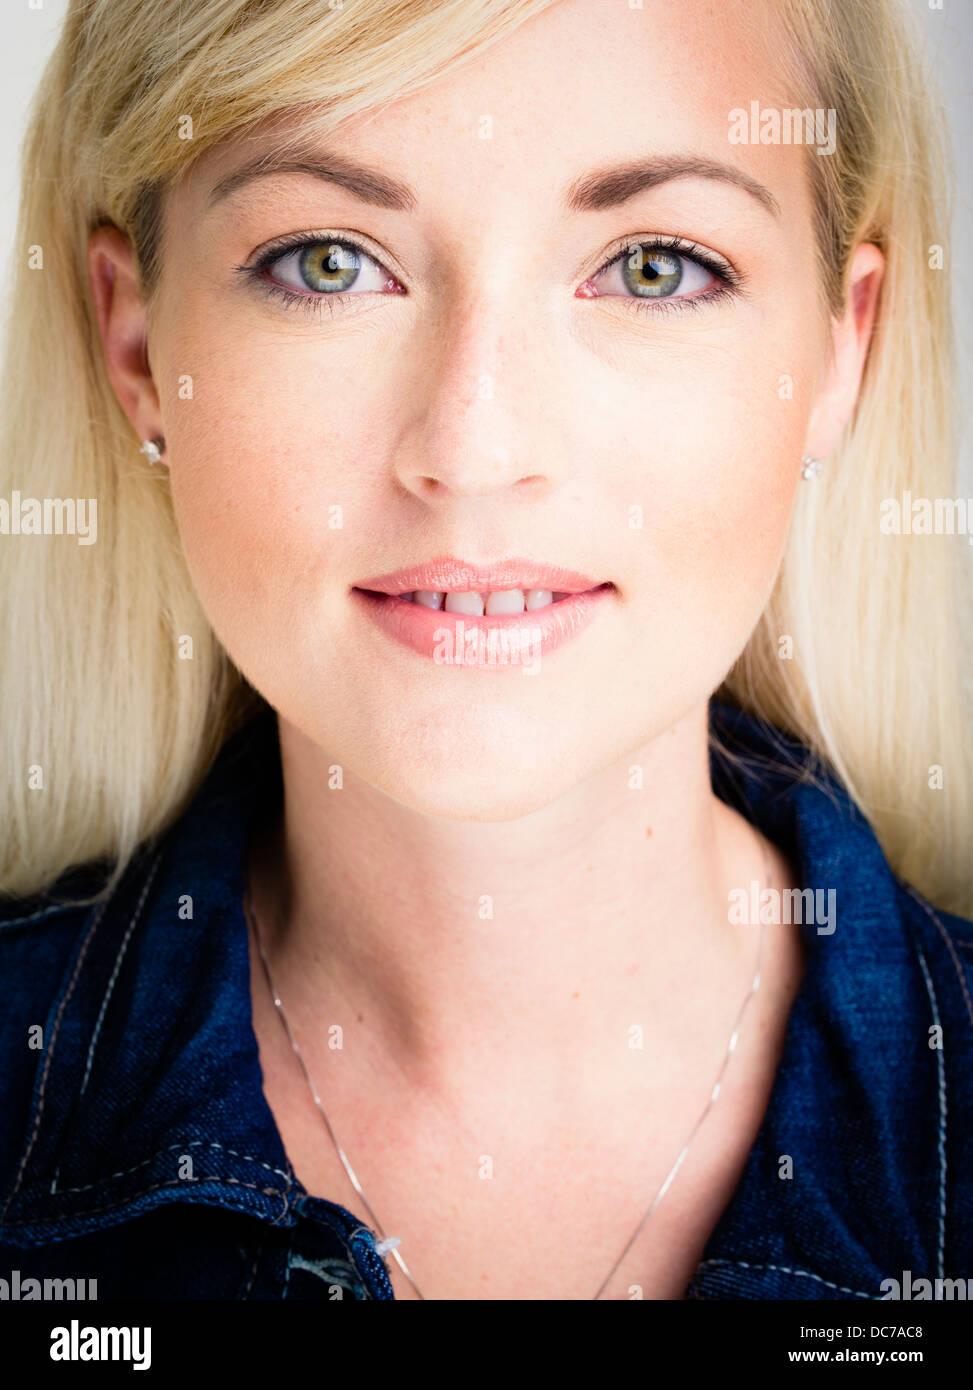 Beautiful blond Caucasian woman in her twenties wearing blue denim jacket - Stock Image